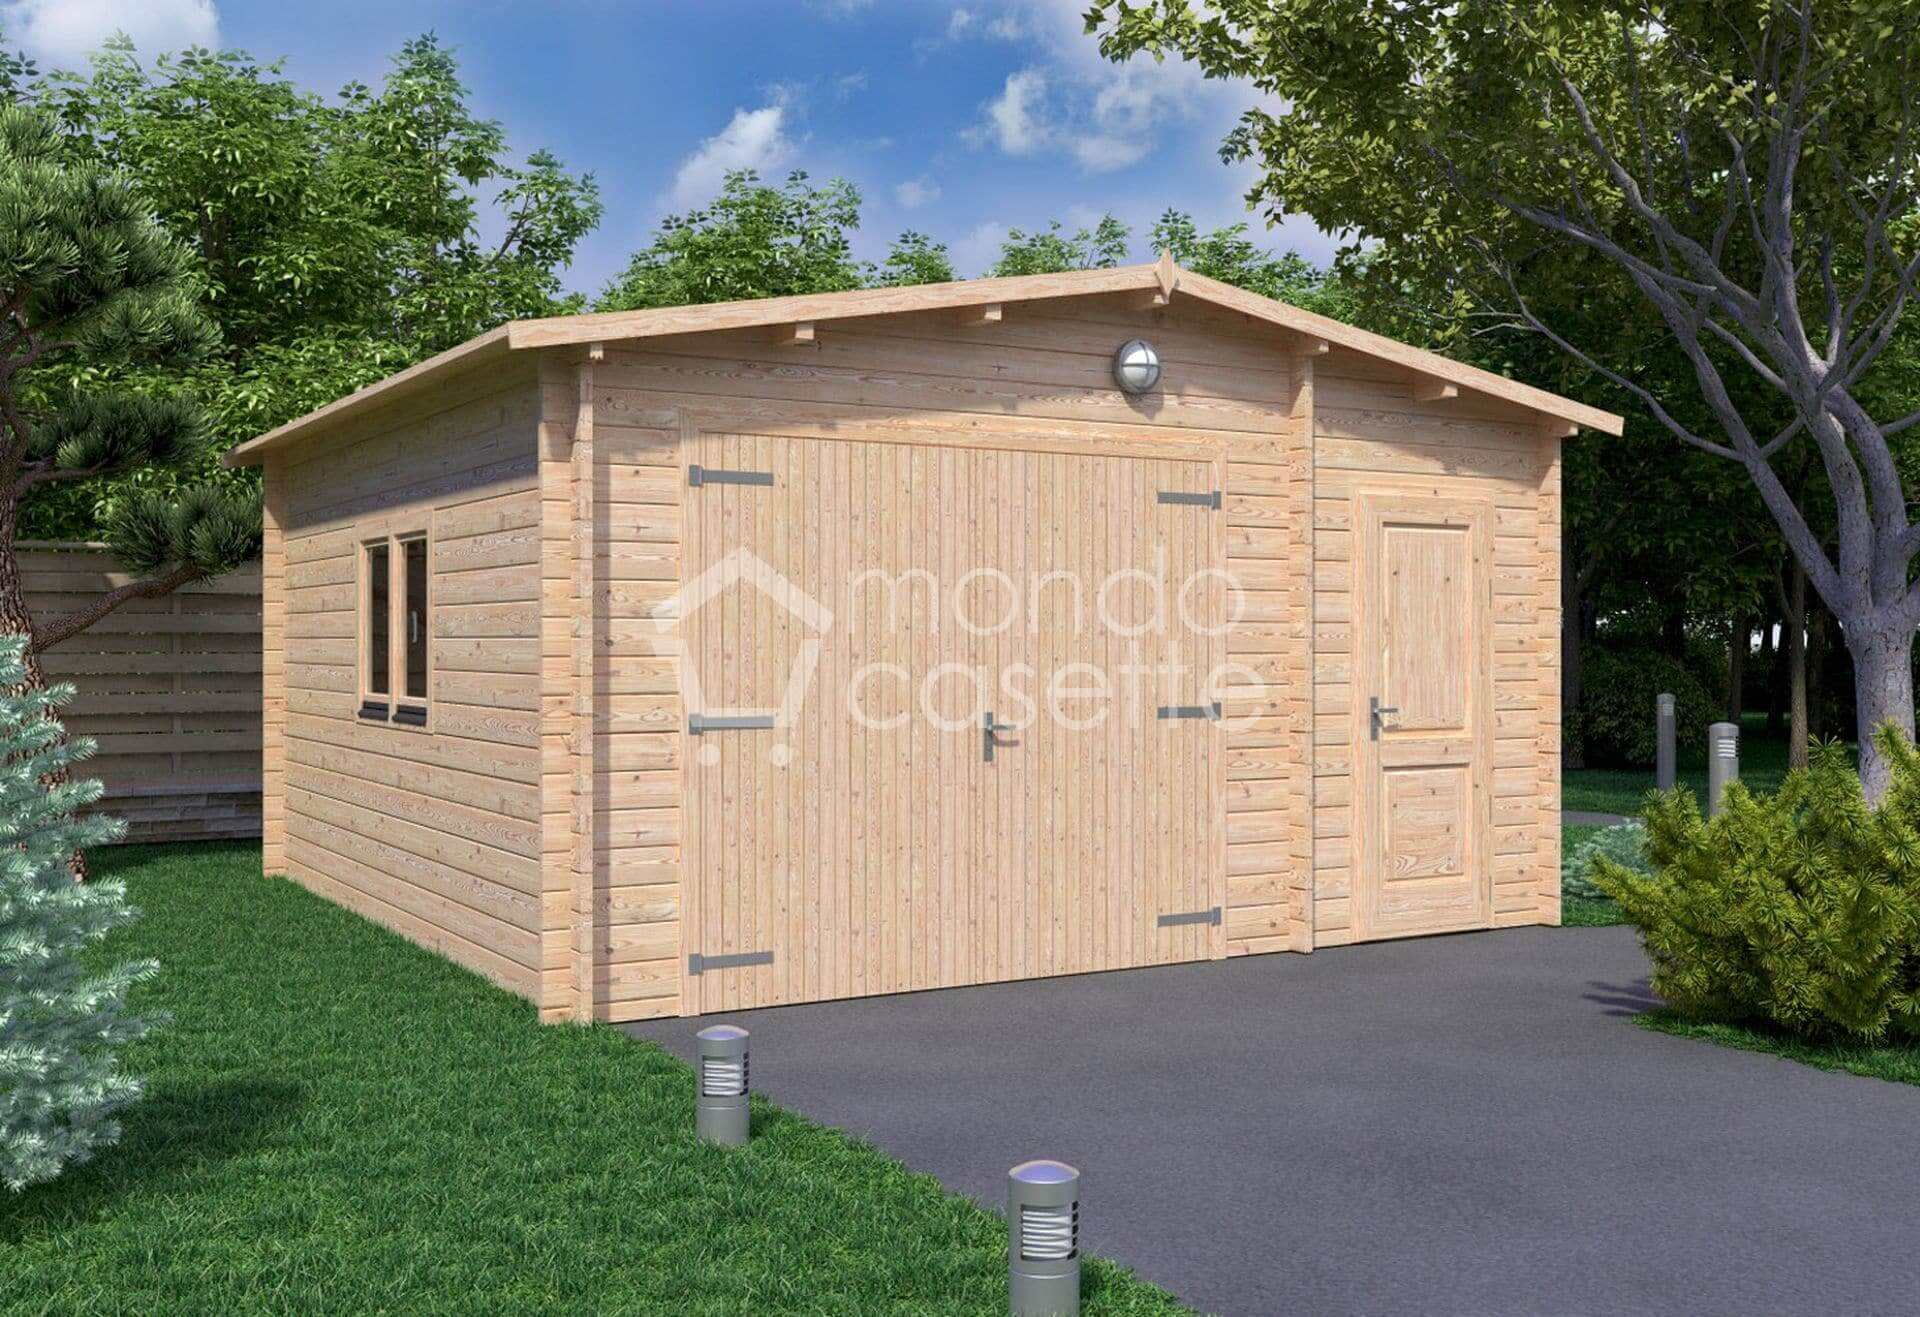 Garage/5 - 5x5 - pareti da 45 mm